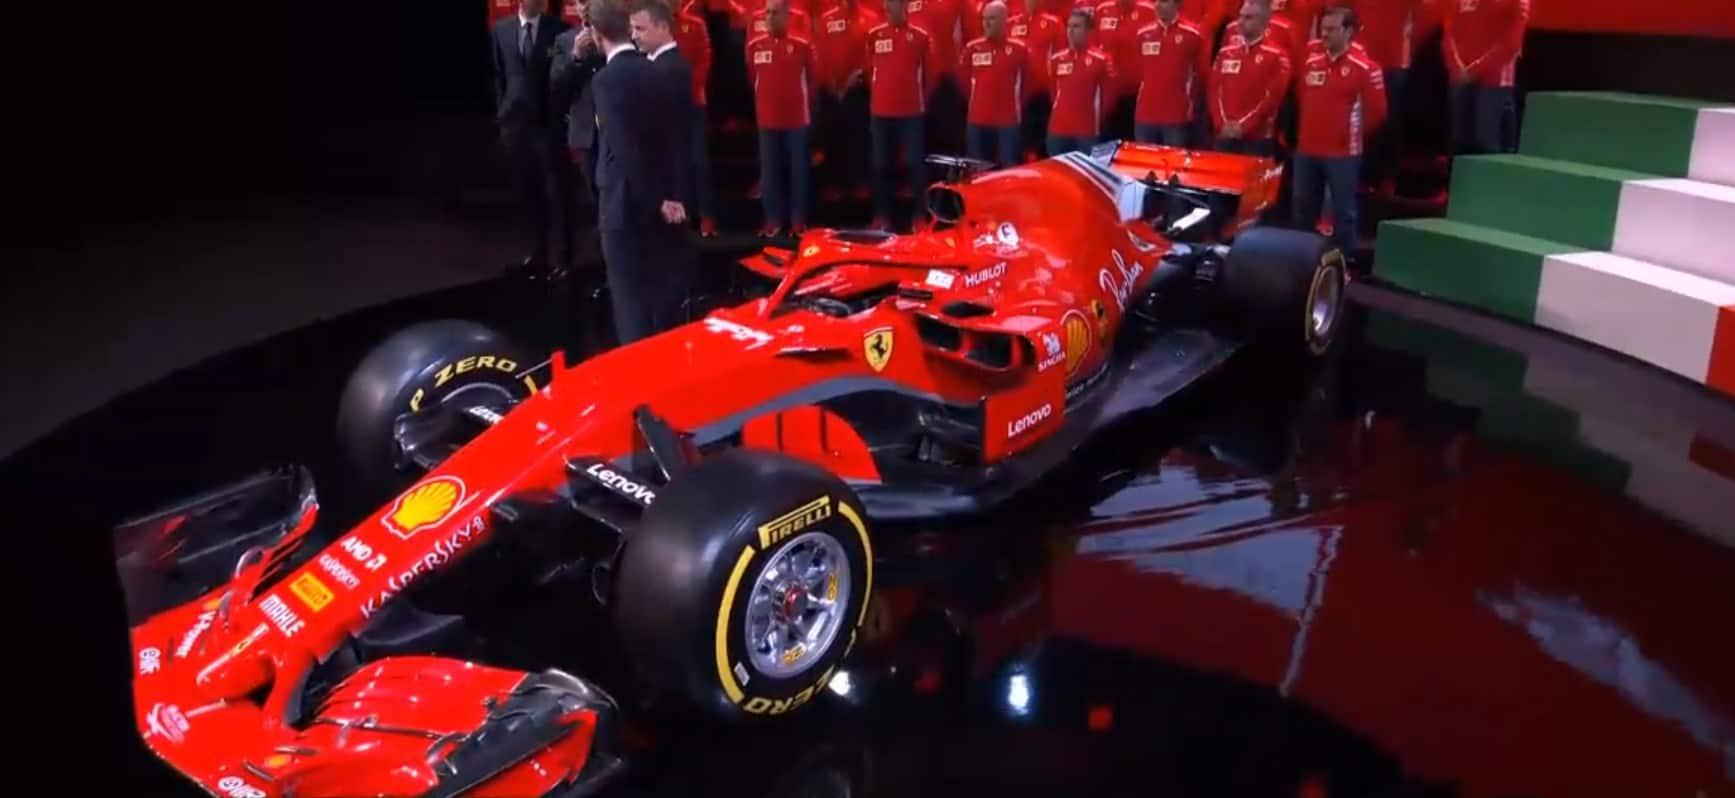 New Ferrari SF71H F1 2018 launch side